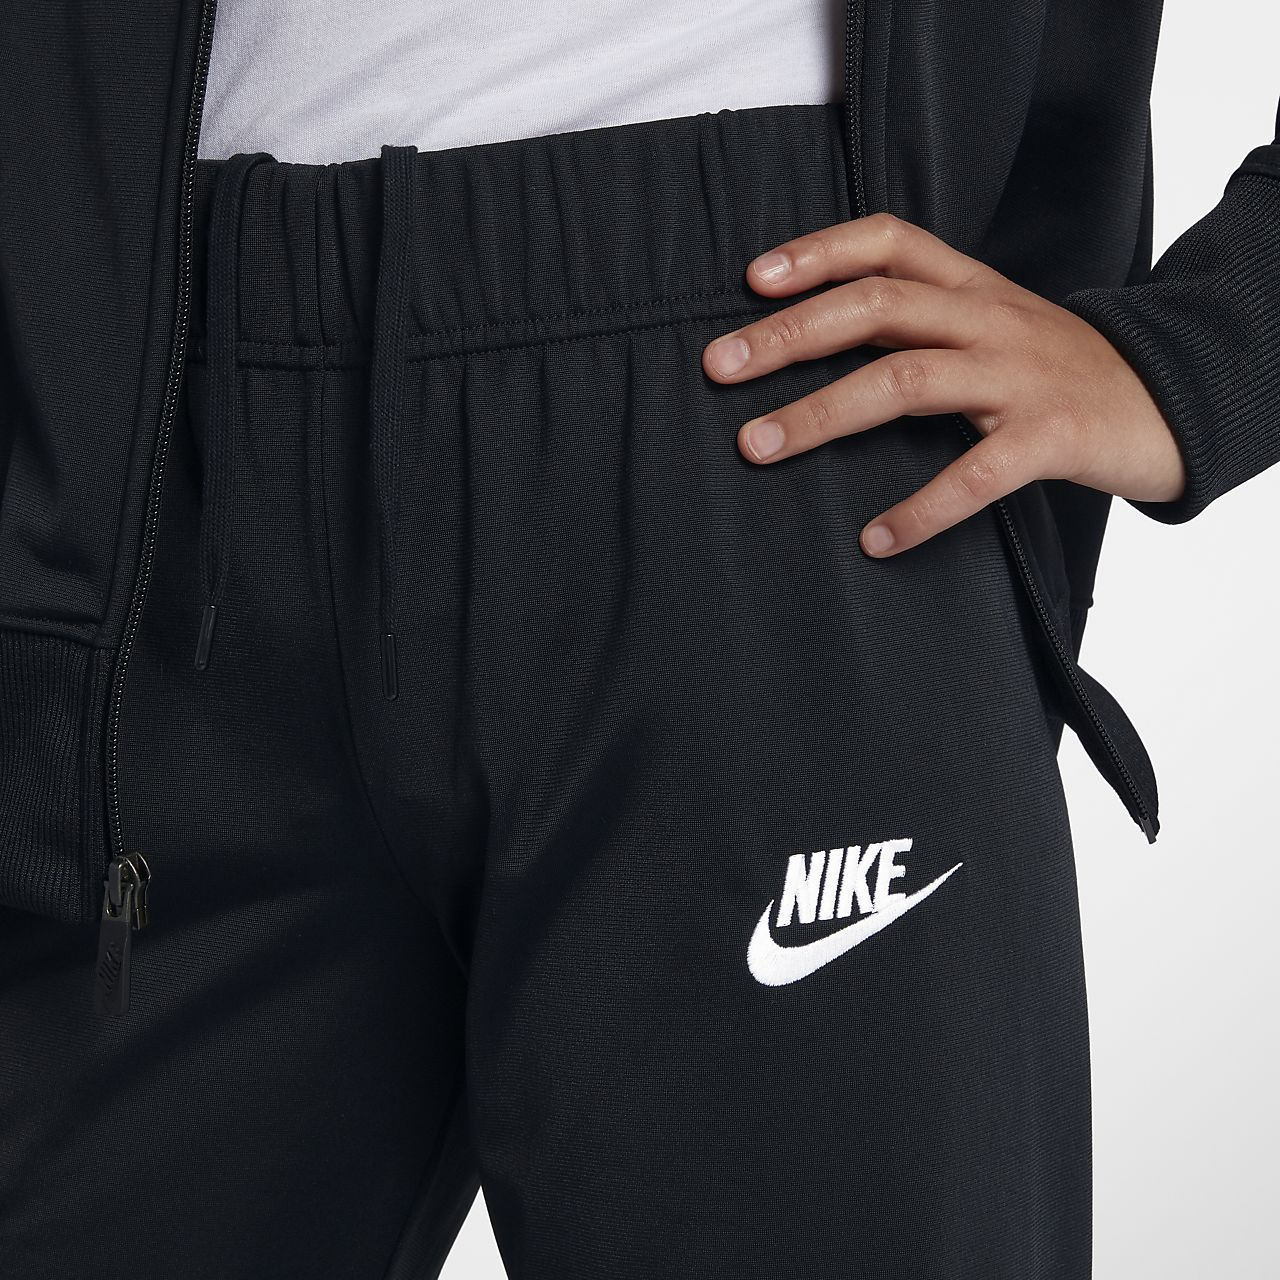 0e5919d1c51 Nike Sportswear Big Kids' (Girls') Tracksuit. Nike.com